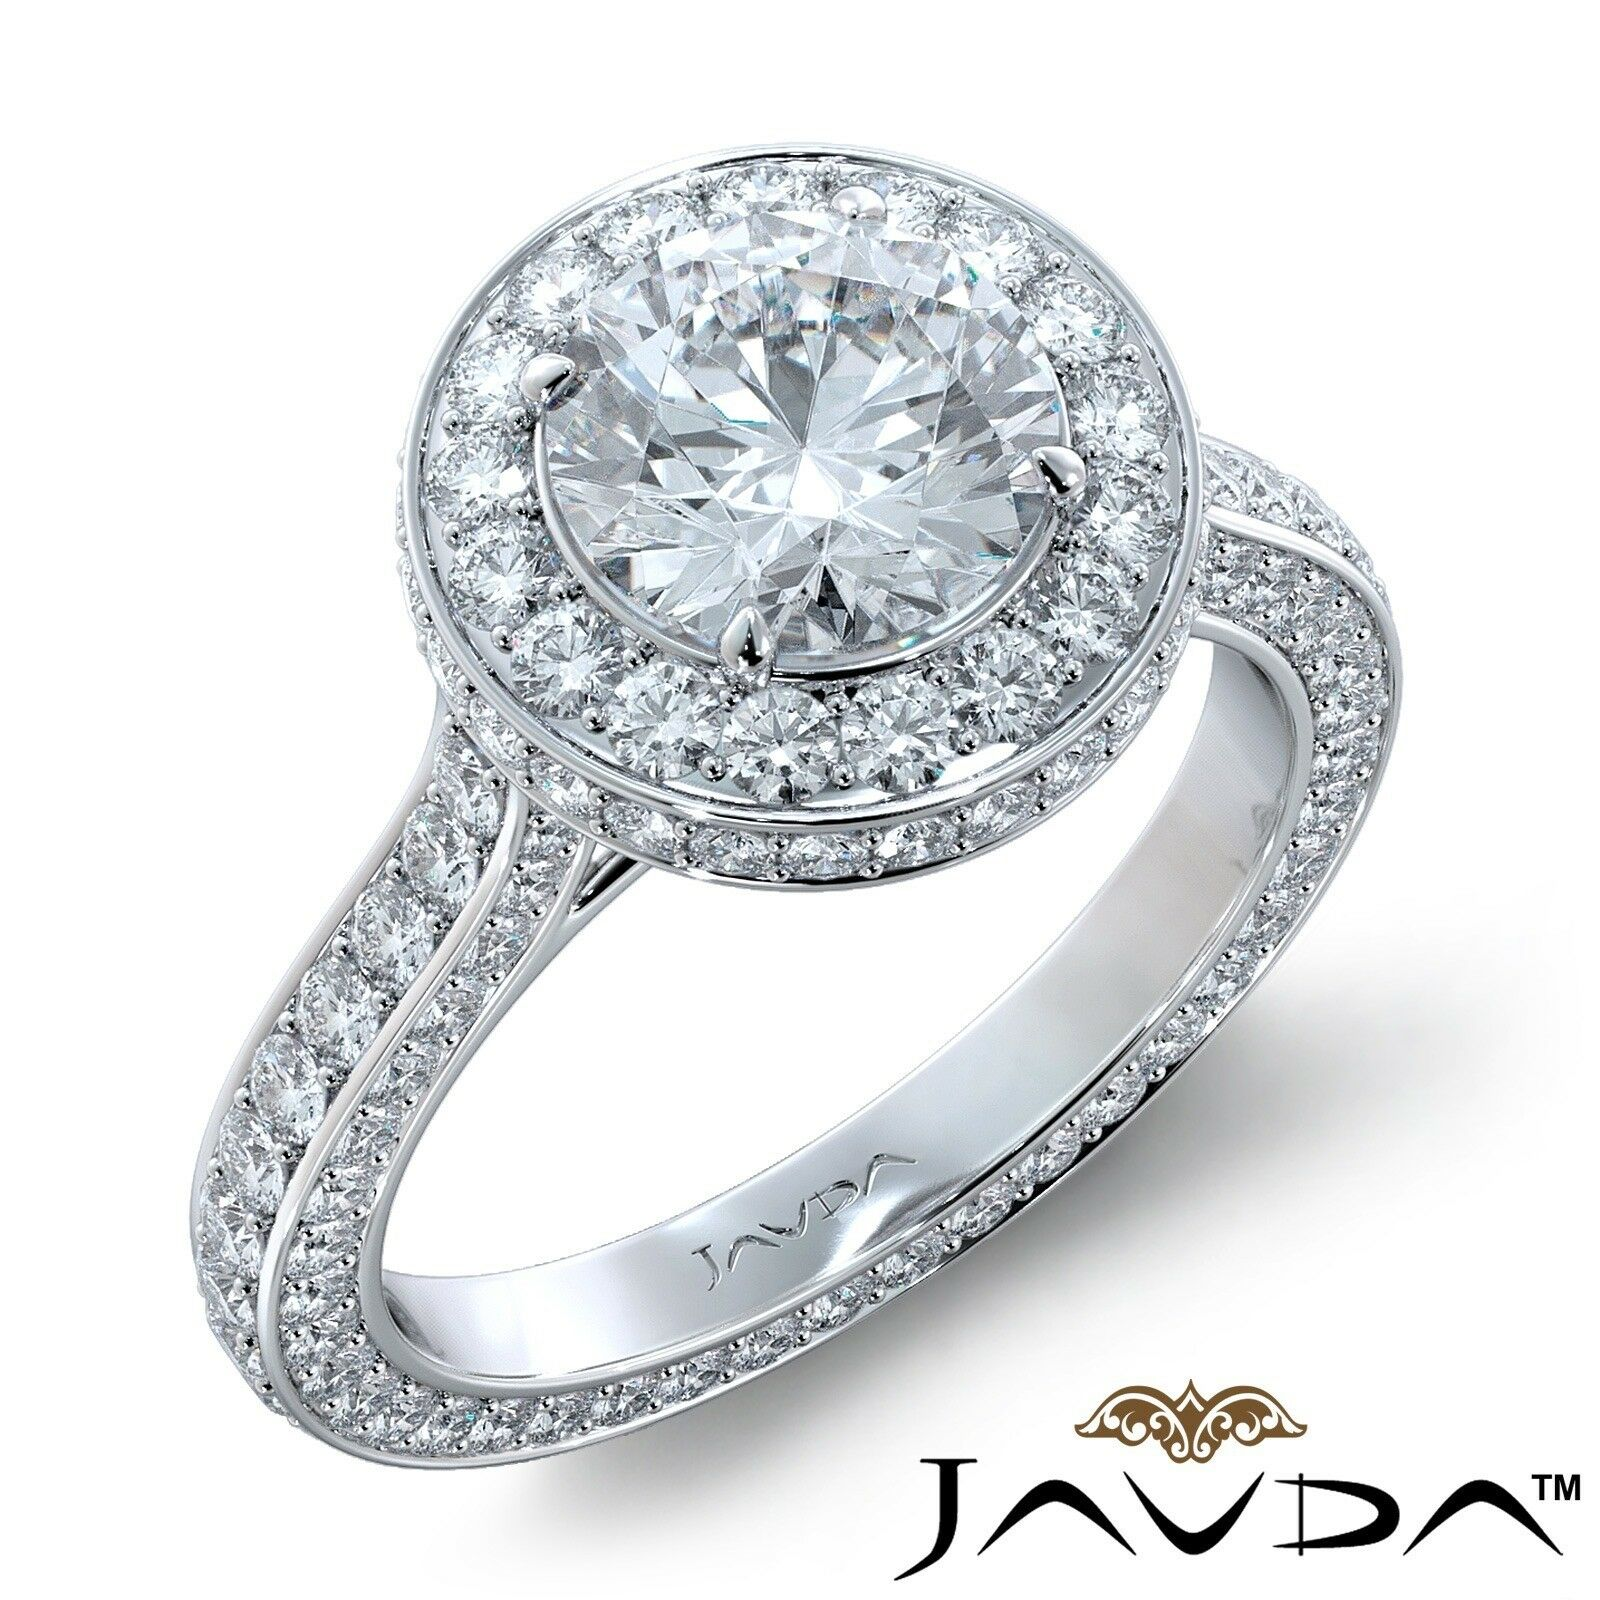 2.9ct Sidestone Eternity Halo Round Diamond Engagement Ring GIA G-VS2 White Gold